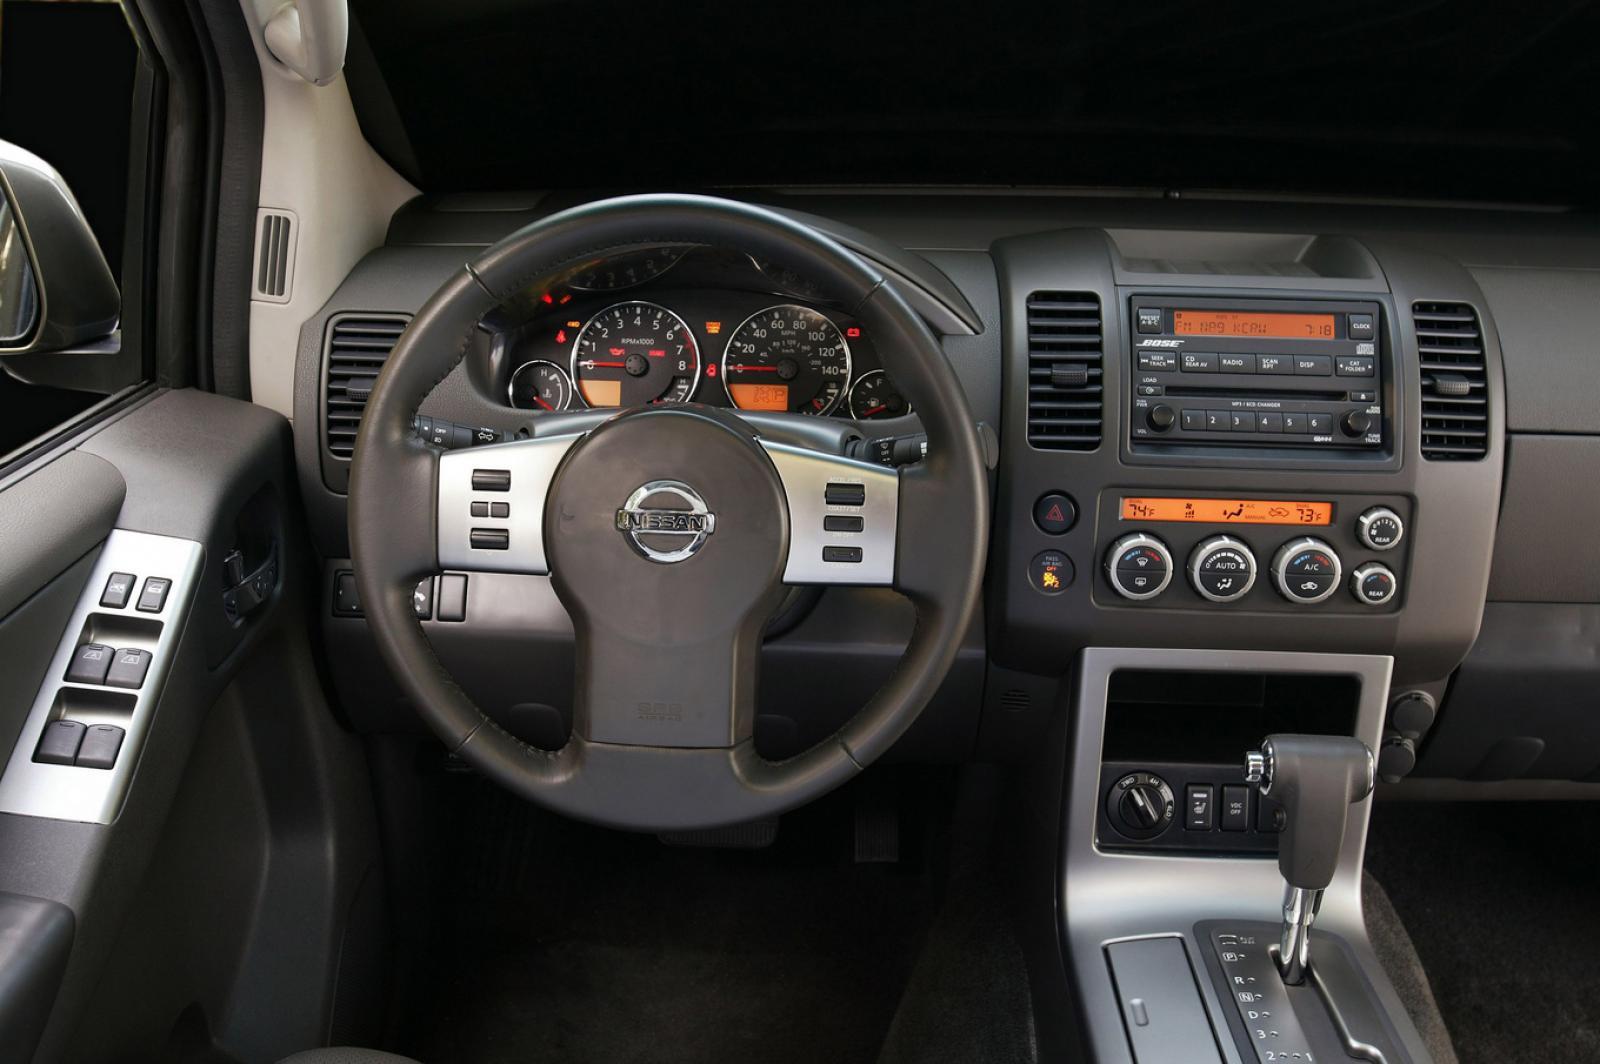 Navara Modification >> 2009 Nissan Pathfinder - Information and photos - ZombieDrive